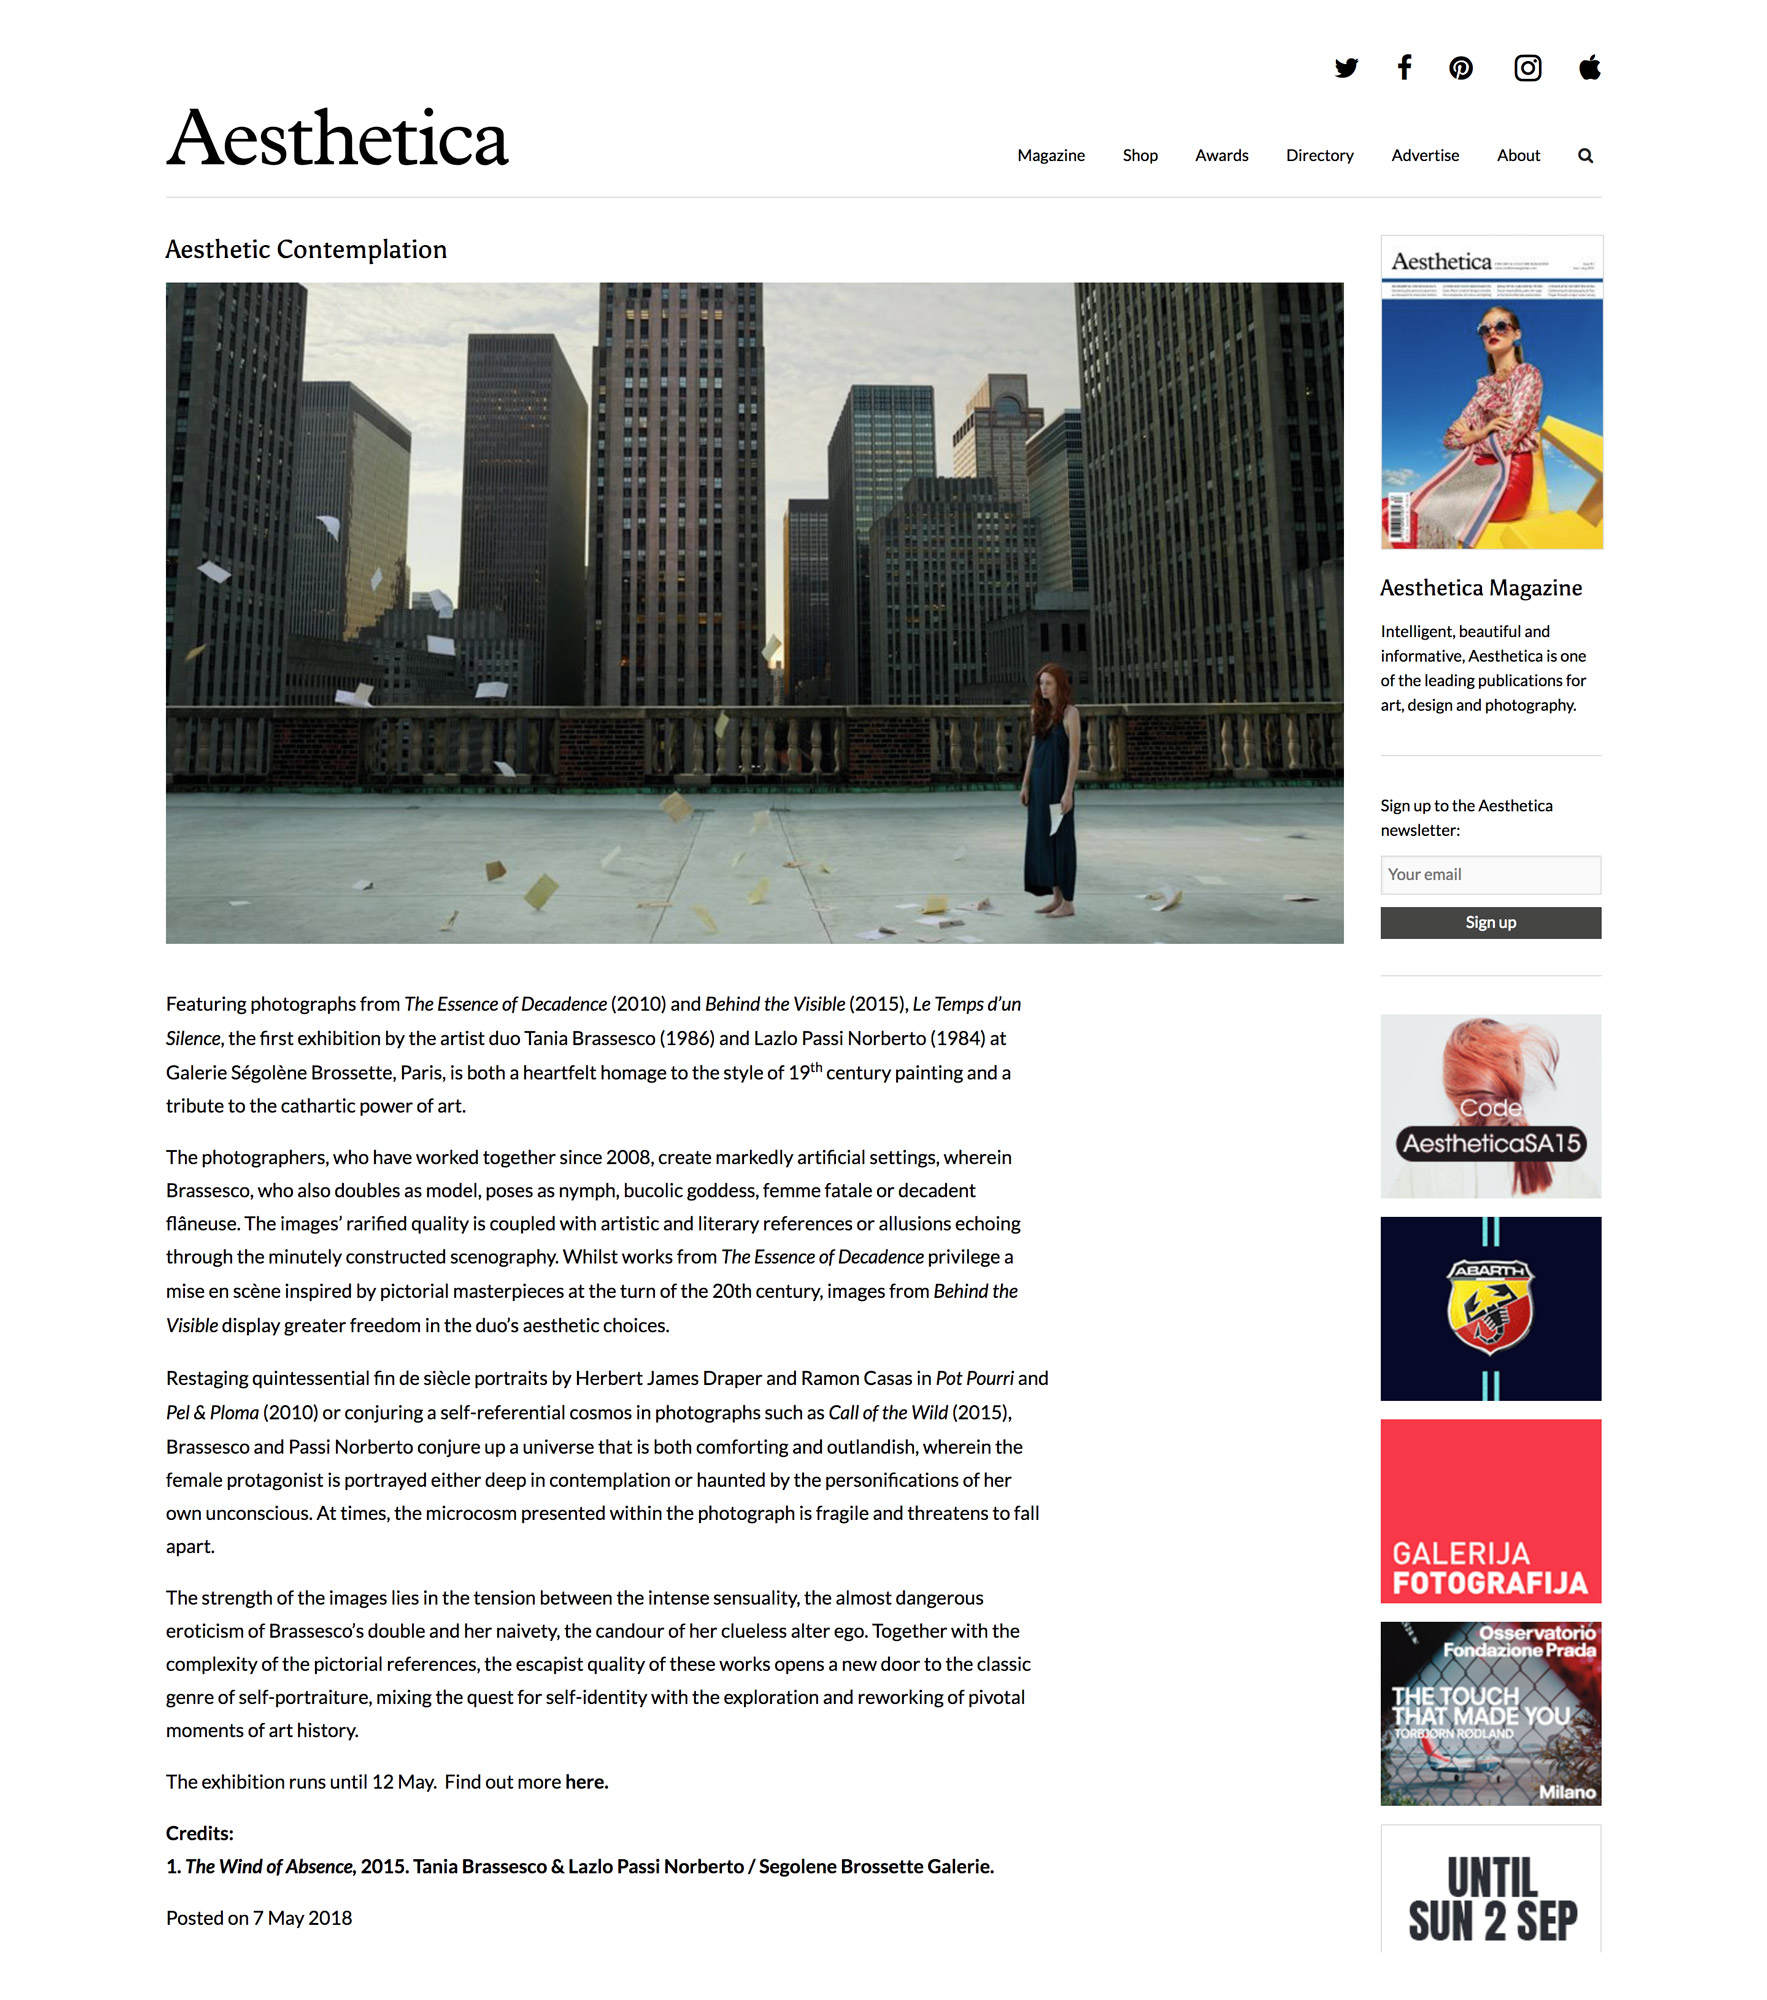 Aesthetica-Article-web.jpg